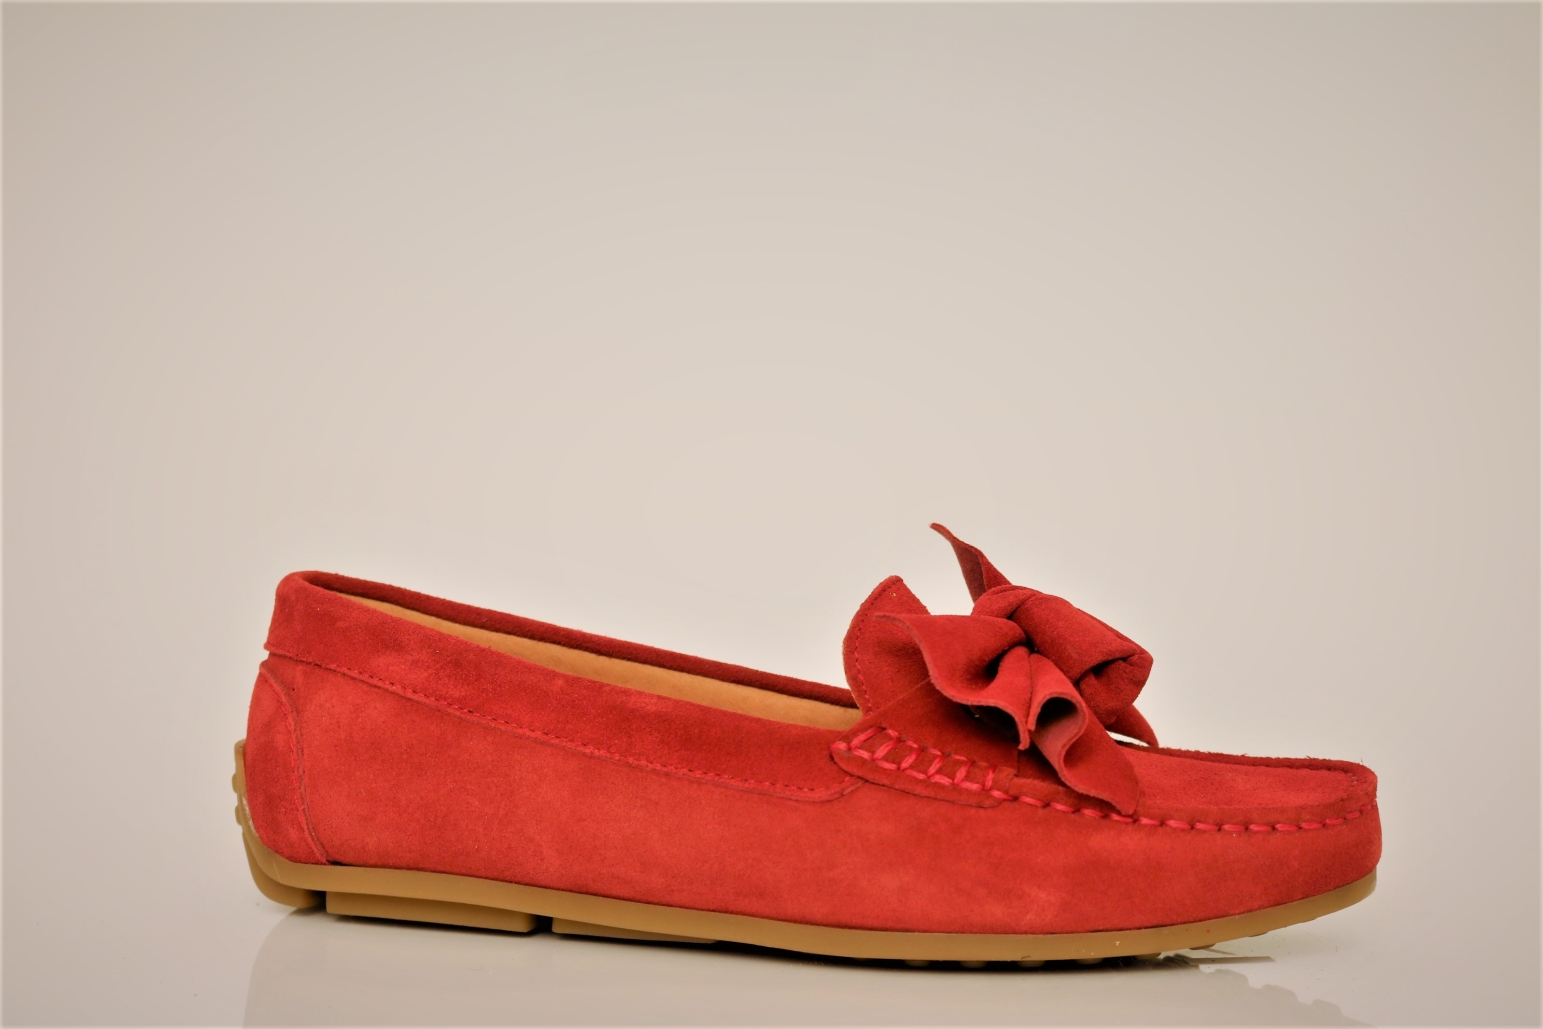 Verf Voor Schoenen Awesome Schoenverf Zwart – Ochtend